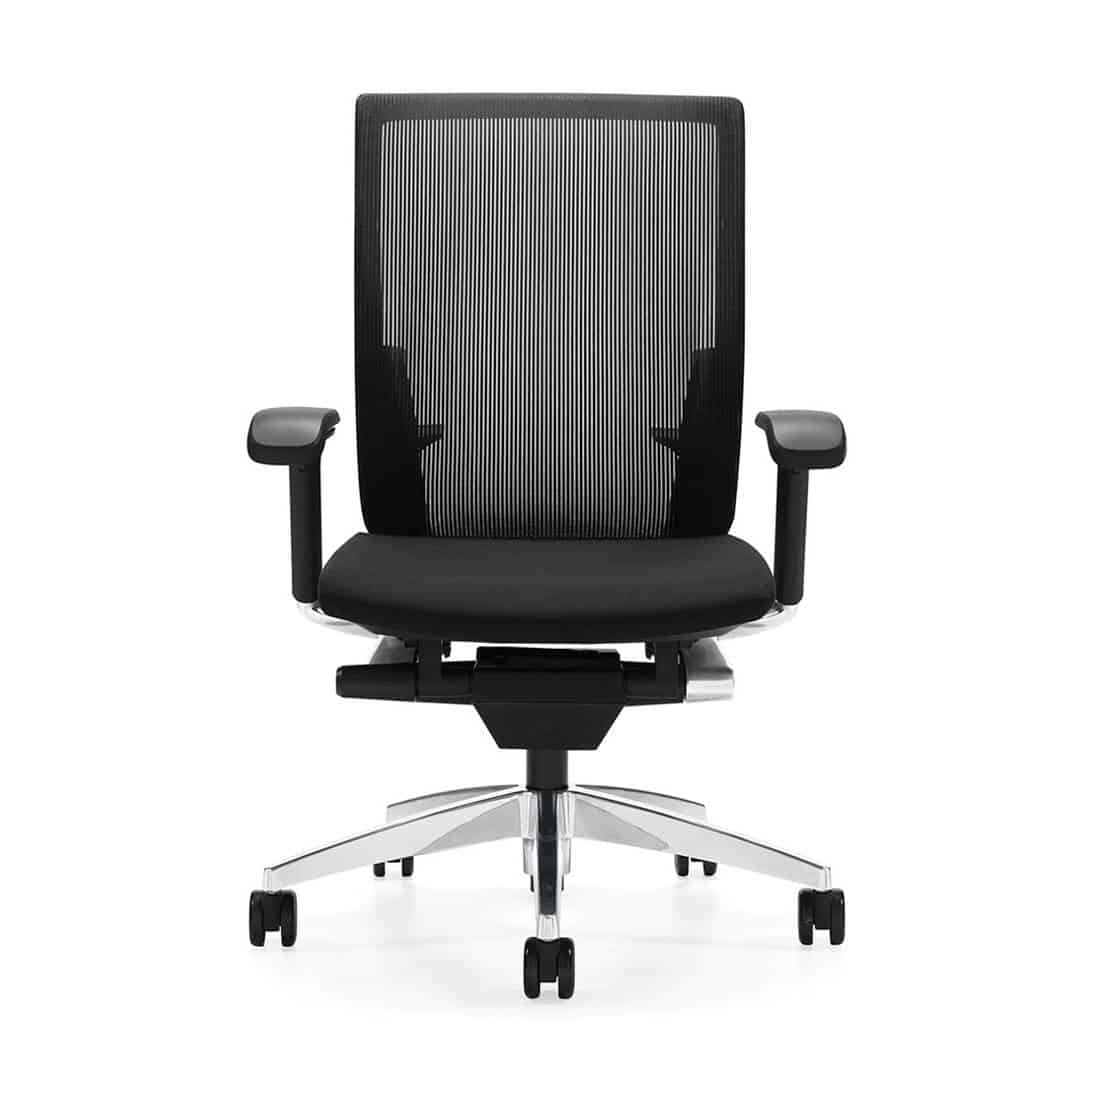 Global G20 High Back Synchro Tilter Mesh Office Chair waterfall edge